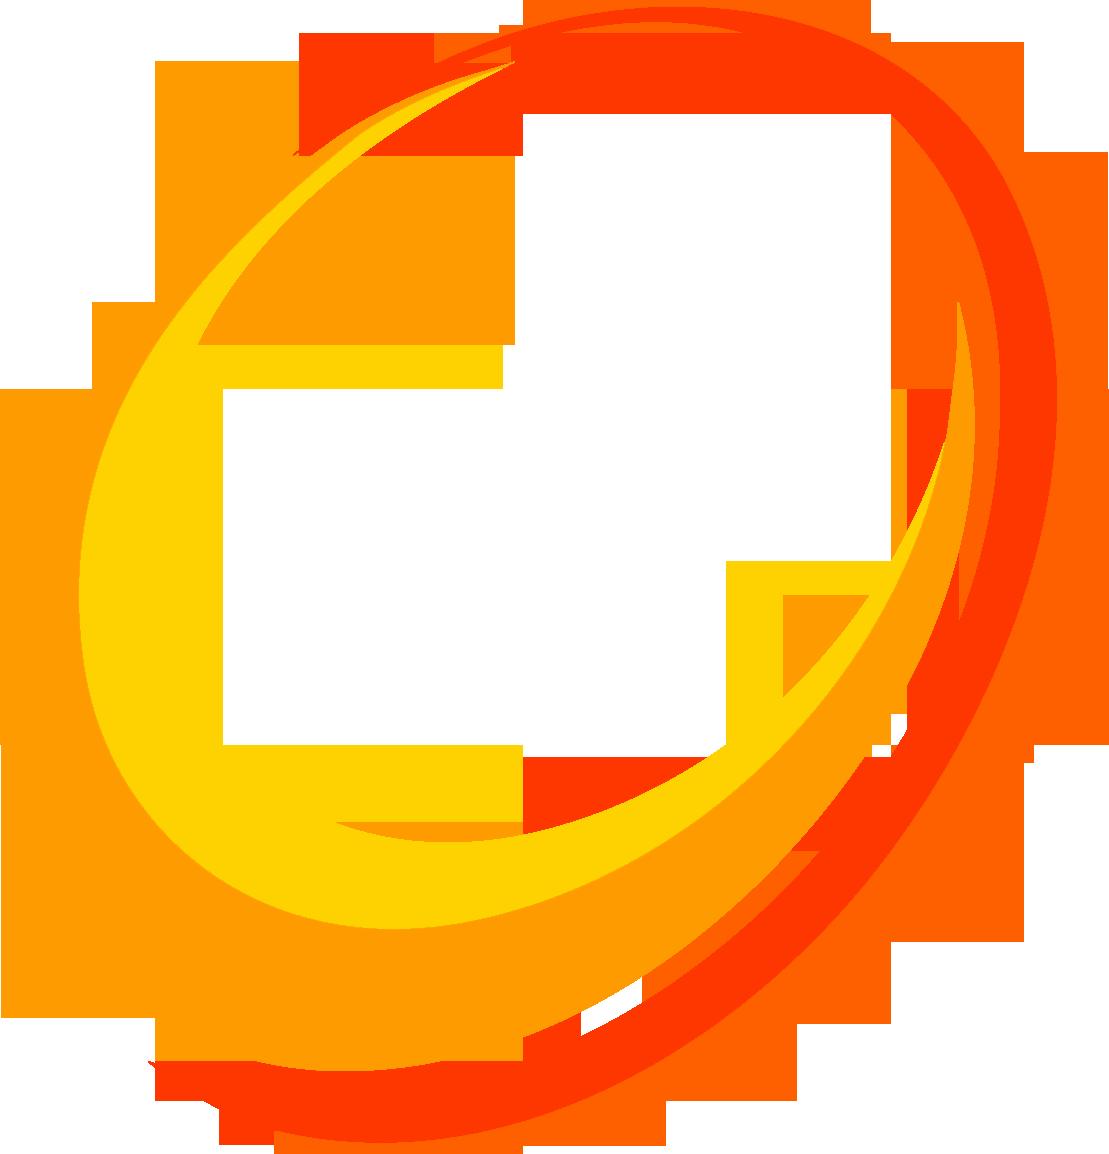 варианта, картинка шаблон логотипа почему